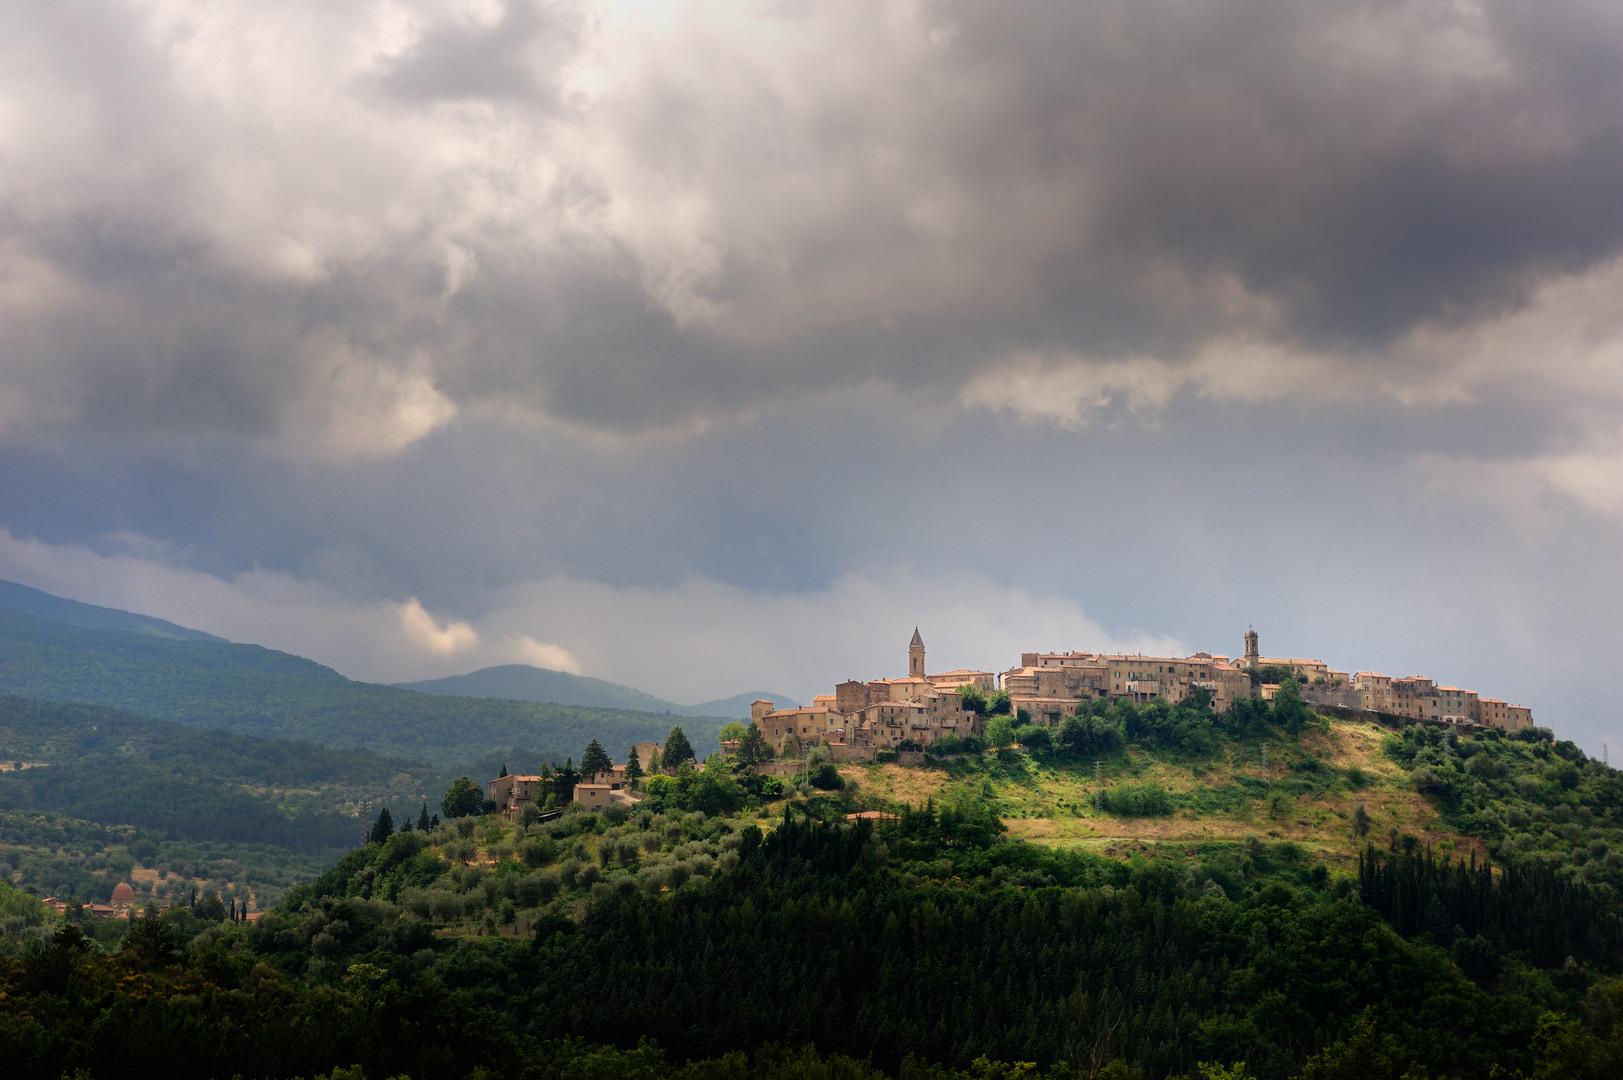 Abbadia San Salvatore, a village of Mount Amiata